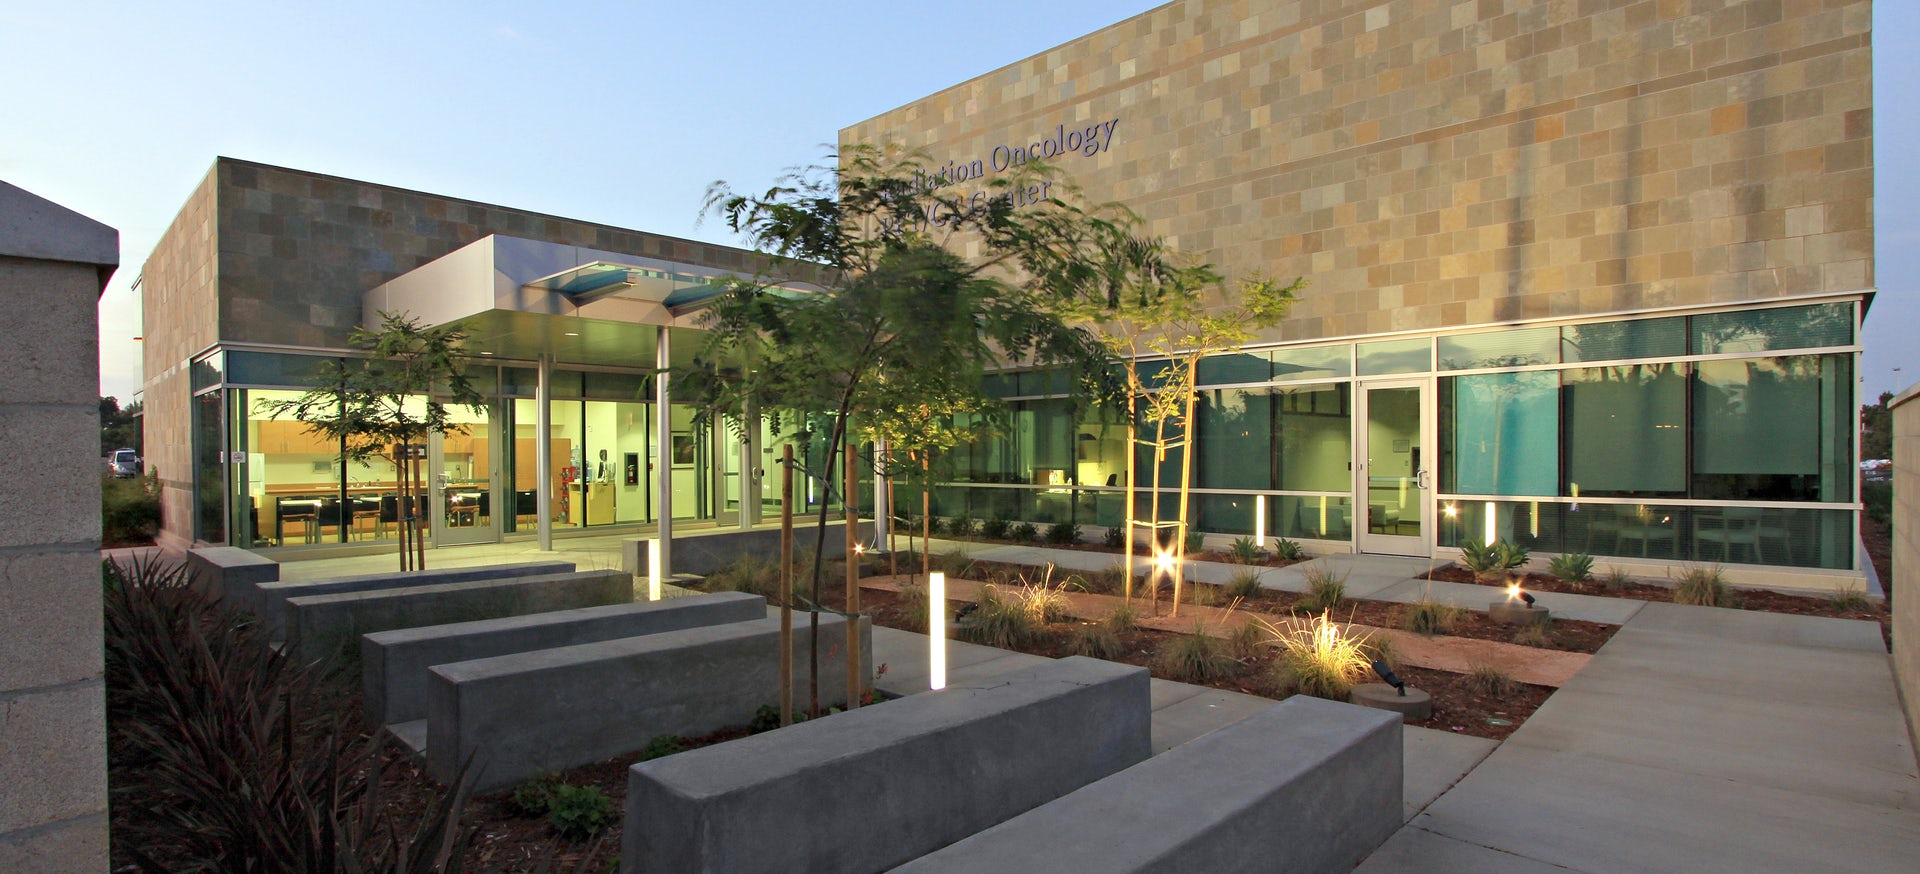 Healthcare Uscd Cancer Center 7 12 16